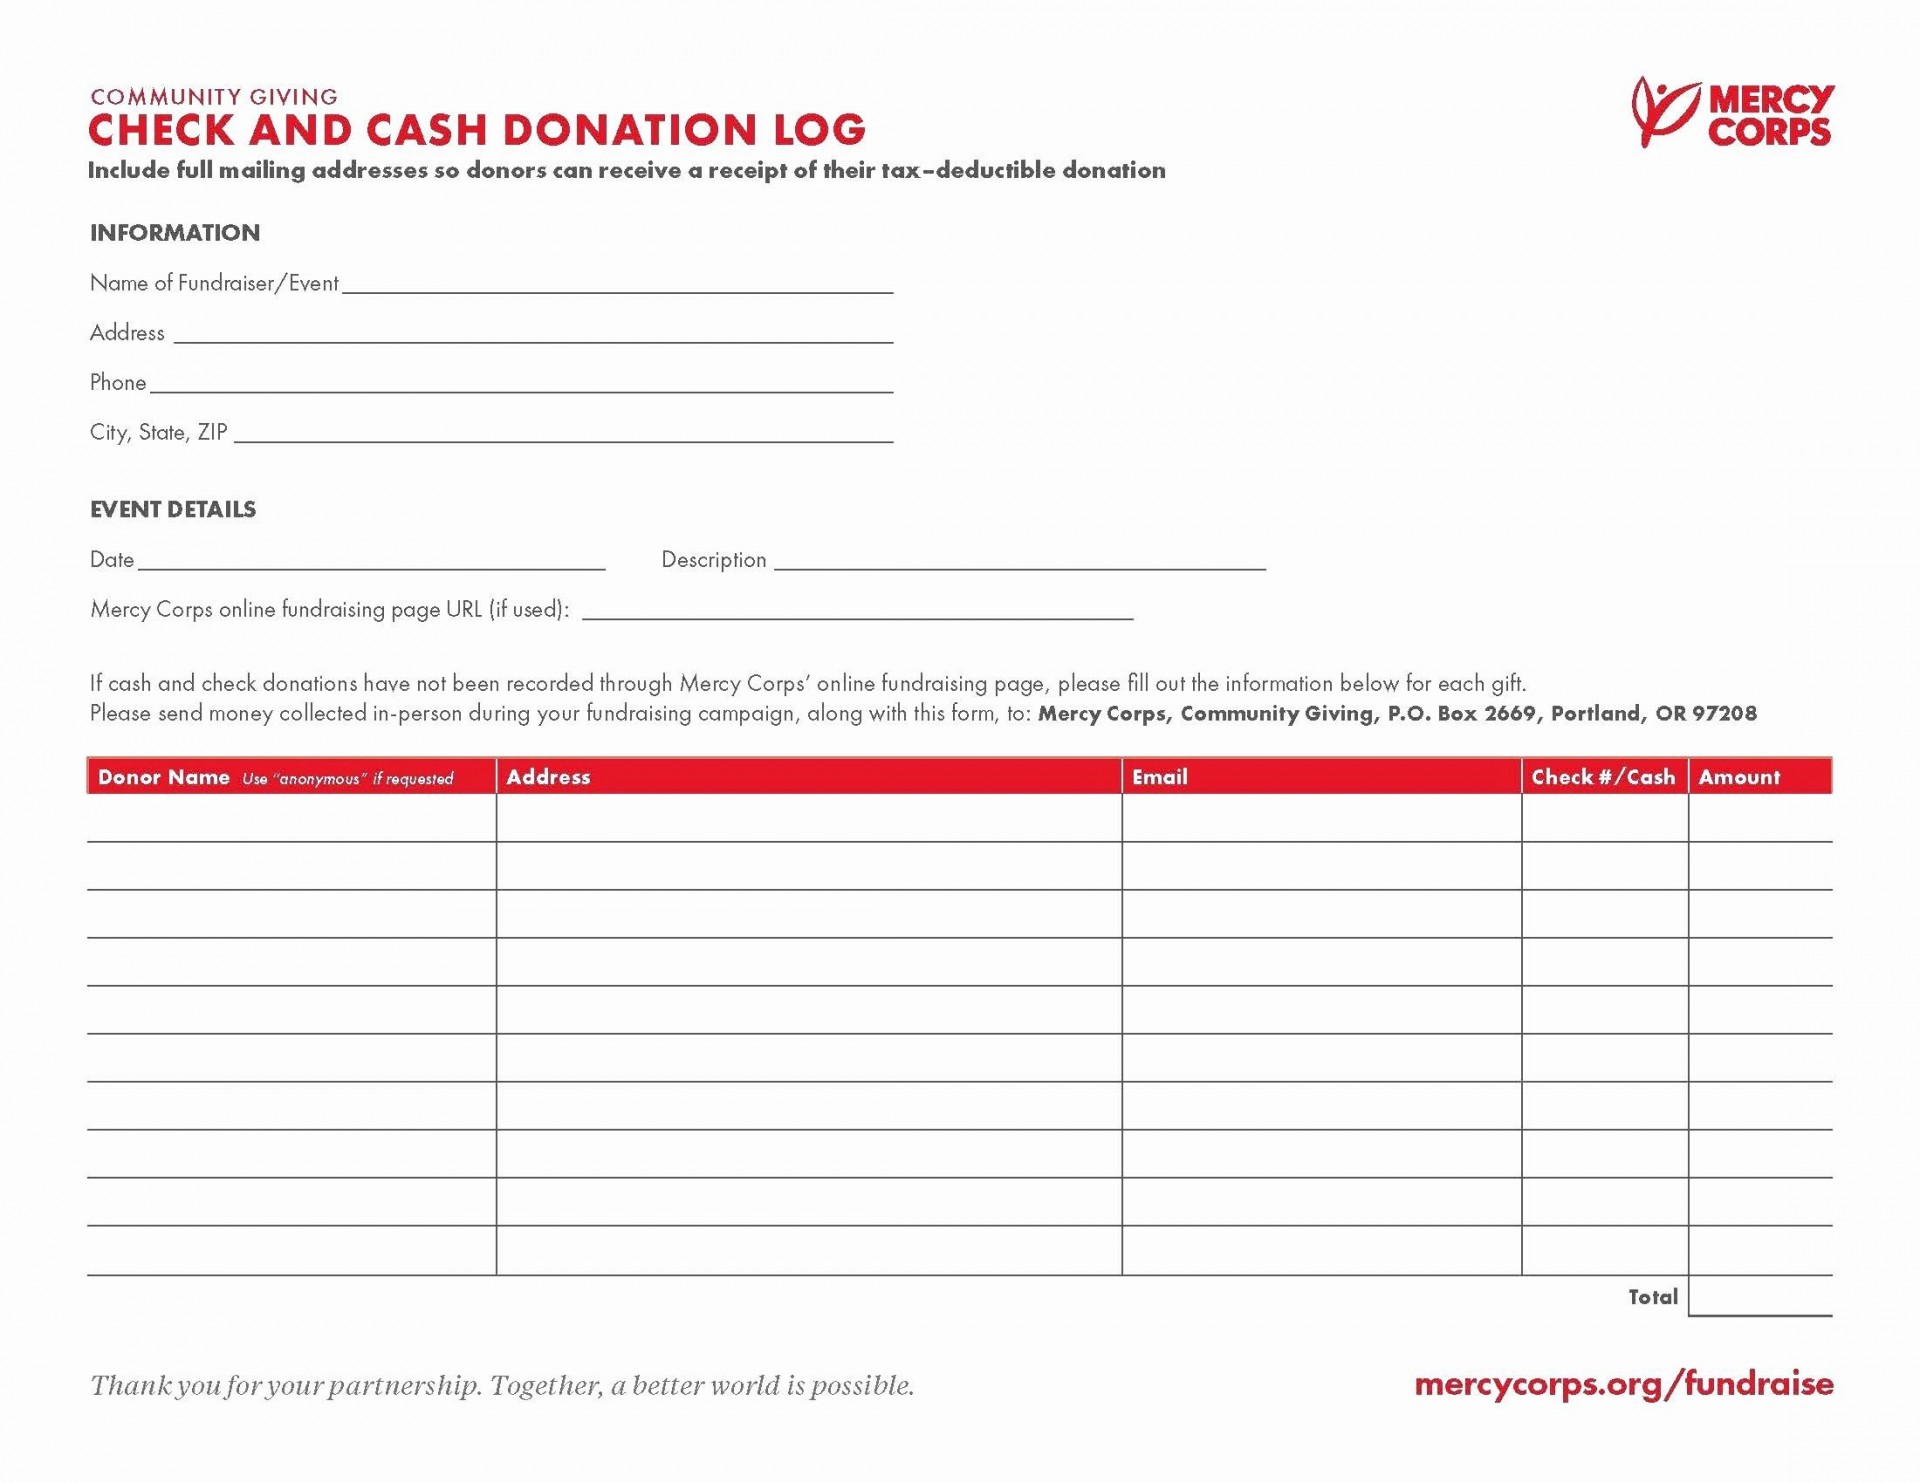 001 Shocking Tax Deductible Donation Receipt Template Australia Design 1920